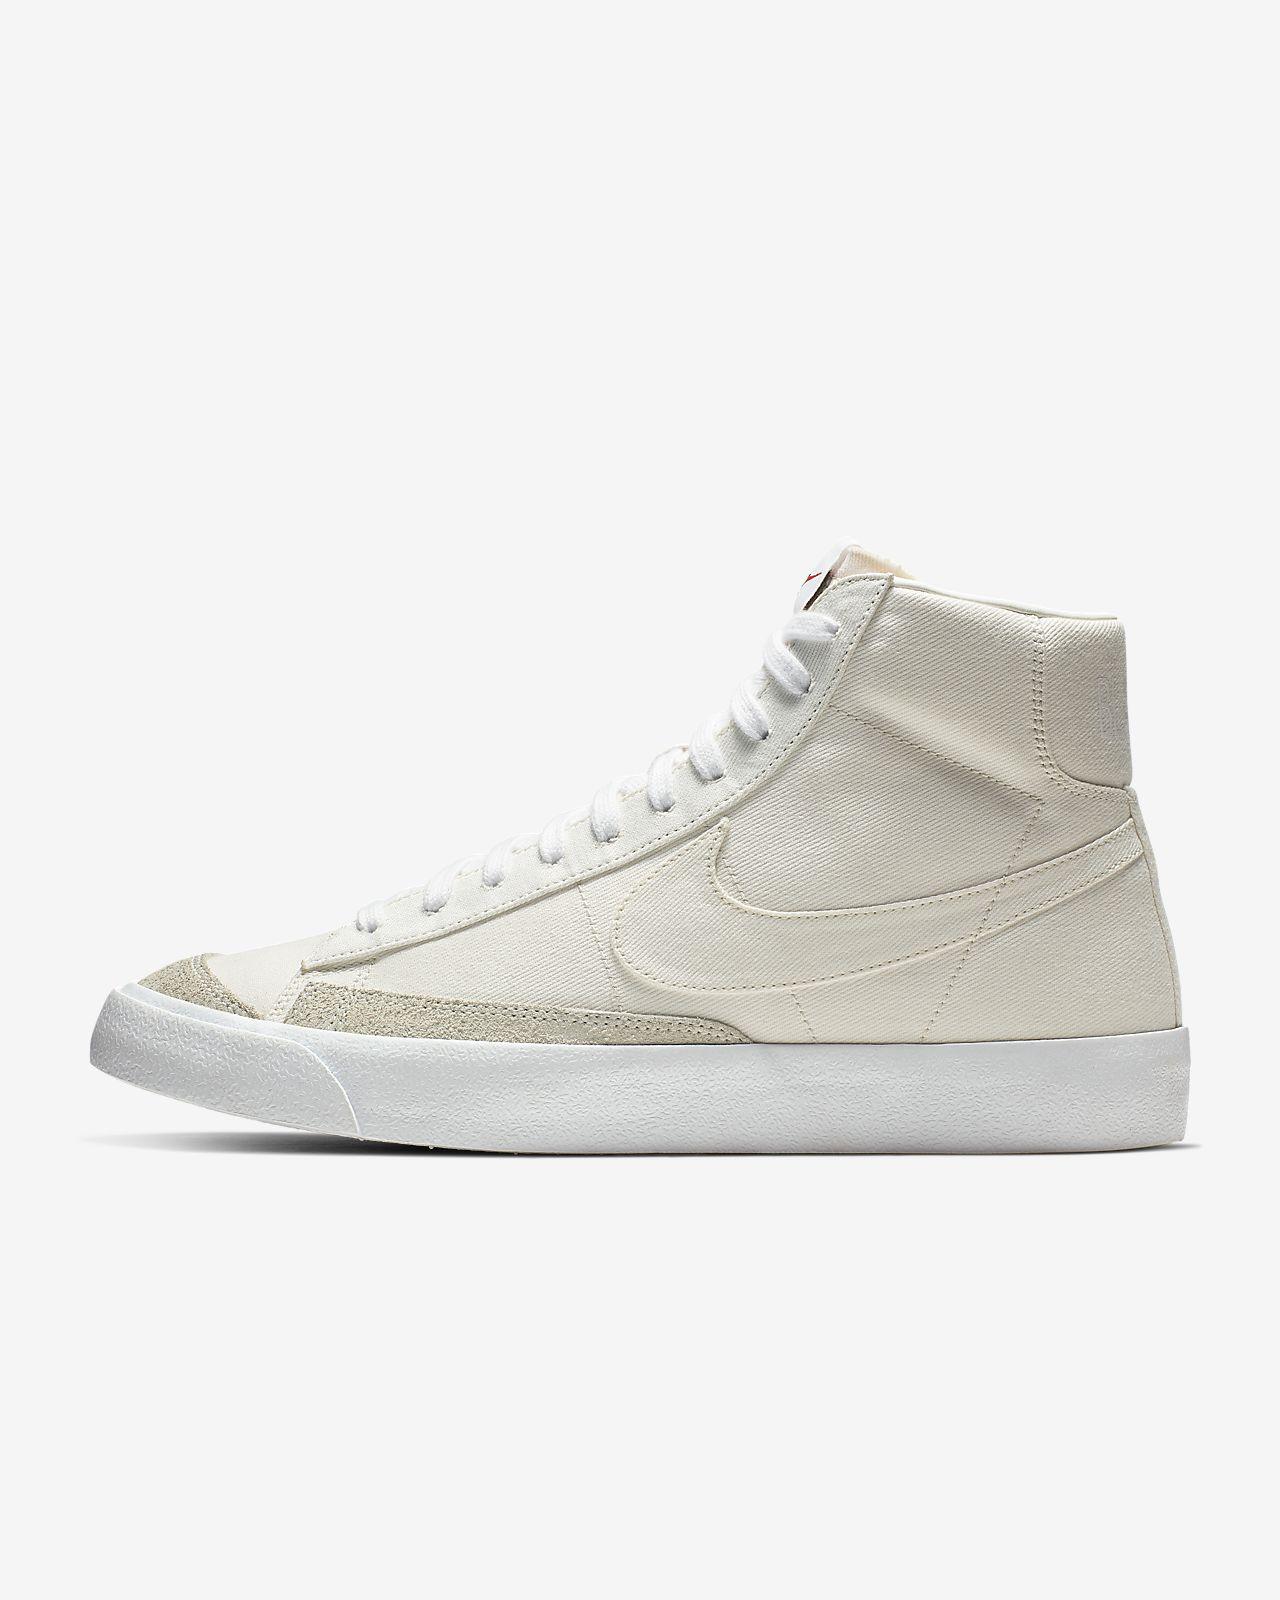 Calzado Nike Blazer Mid '77 Vintage WE